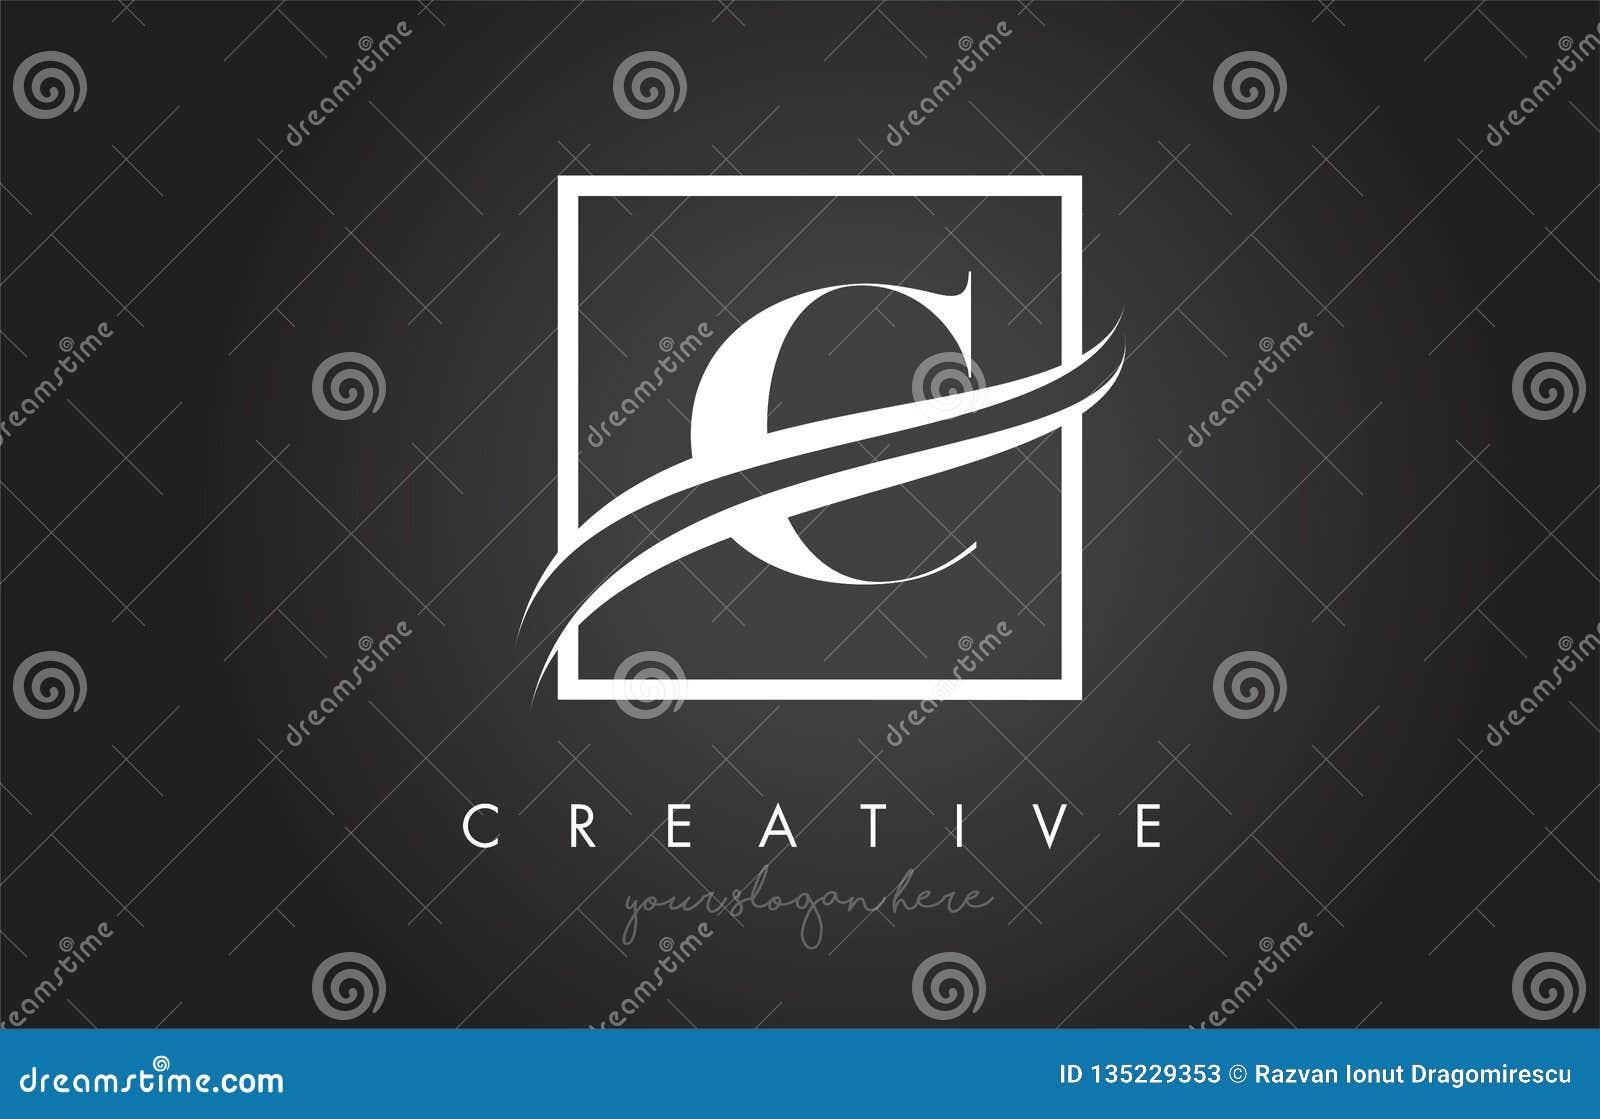 C Letter Logo Design with Square Swoosh Border and Creative Icon Design